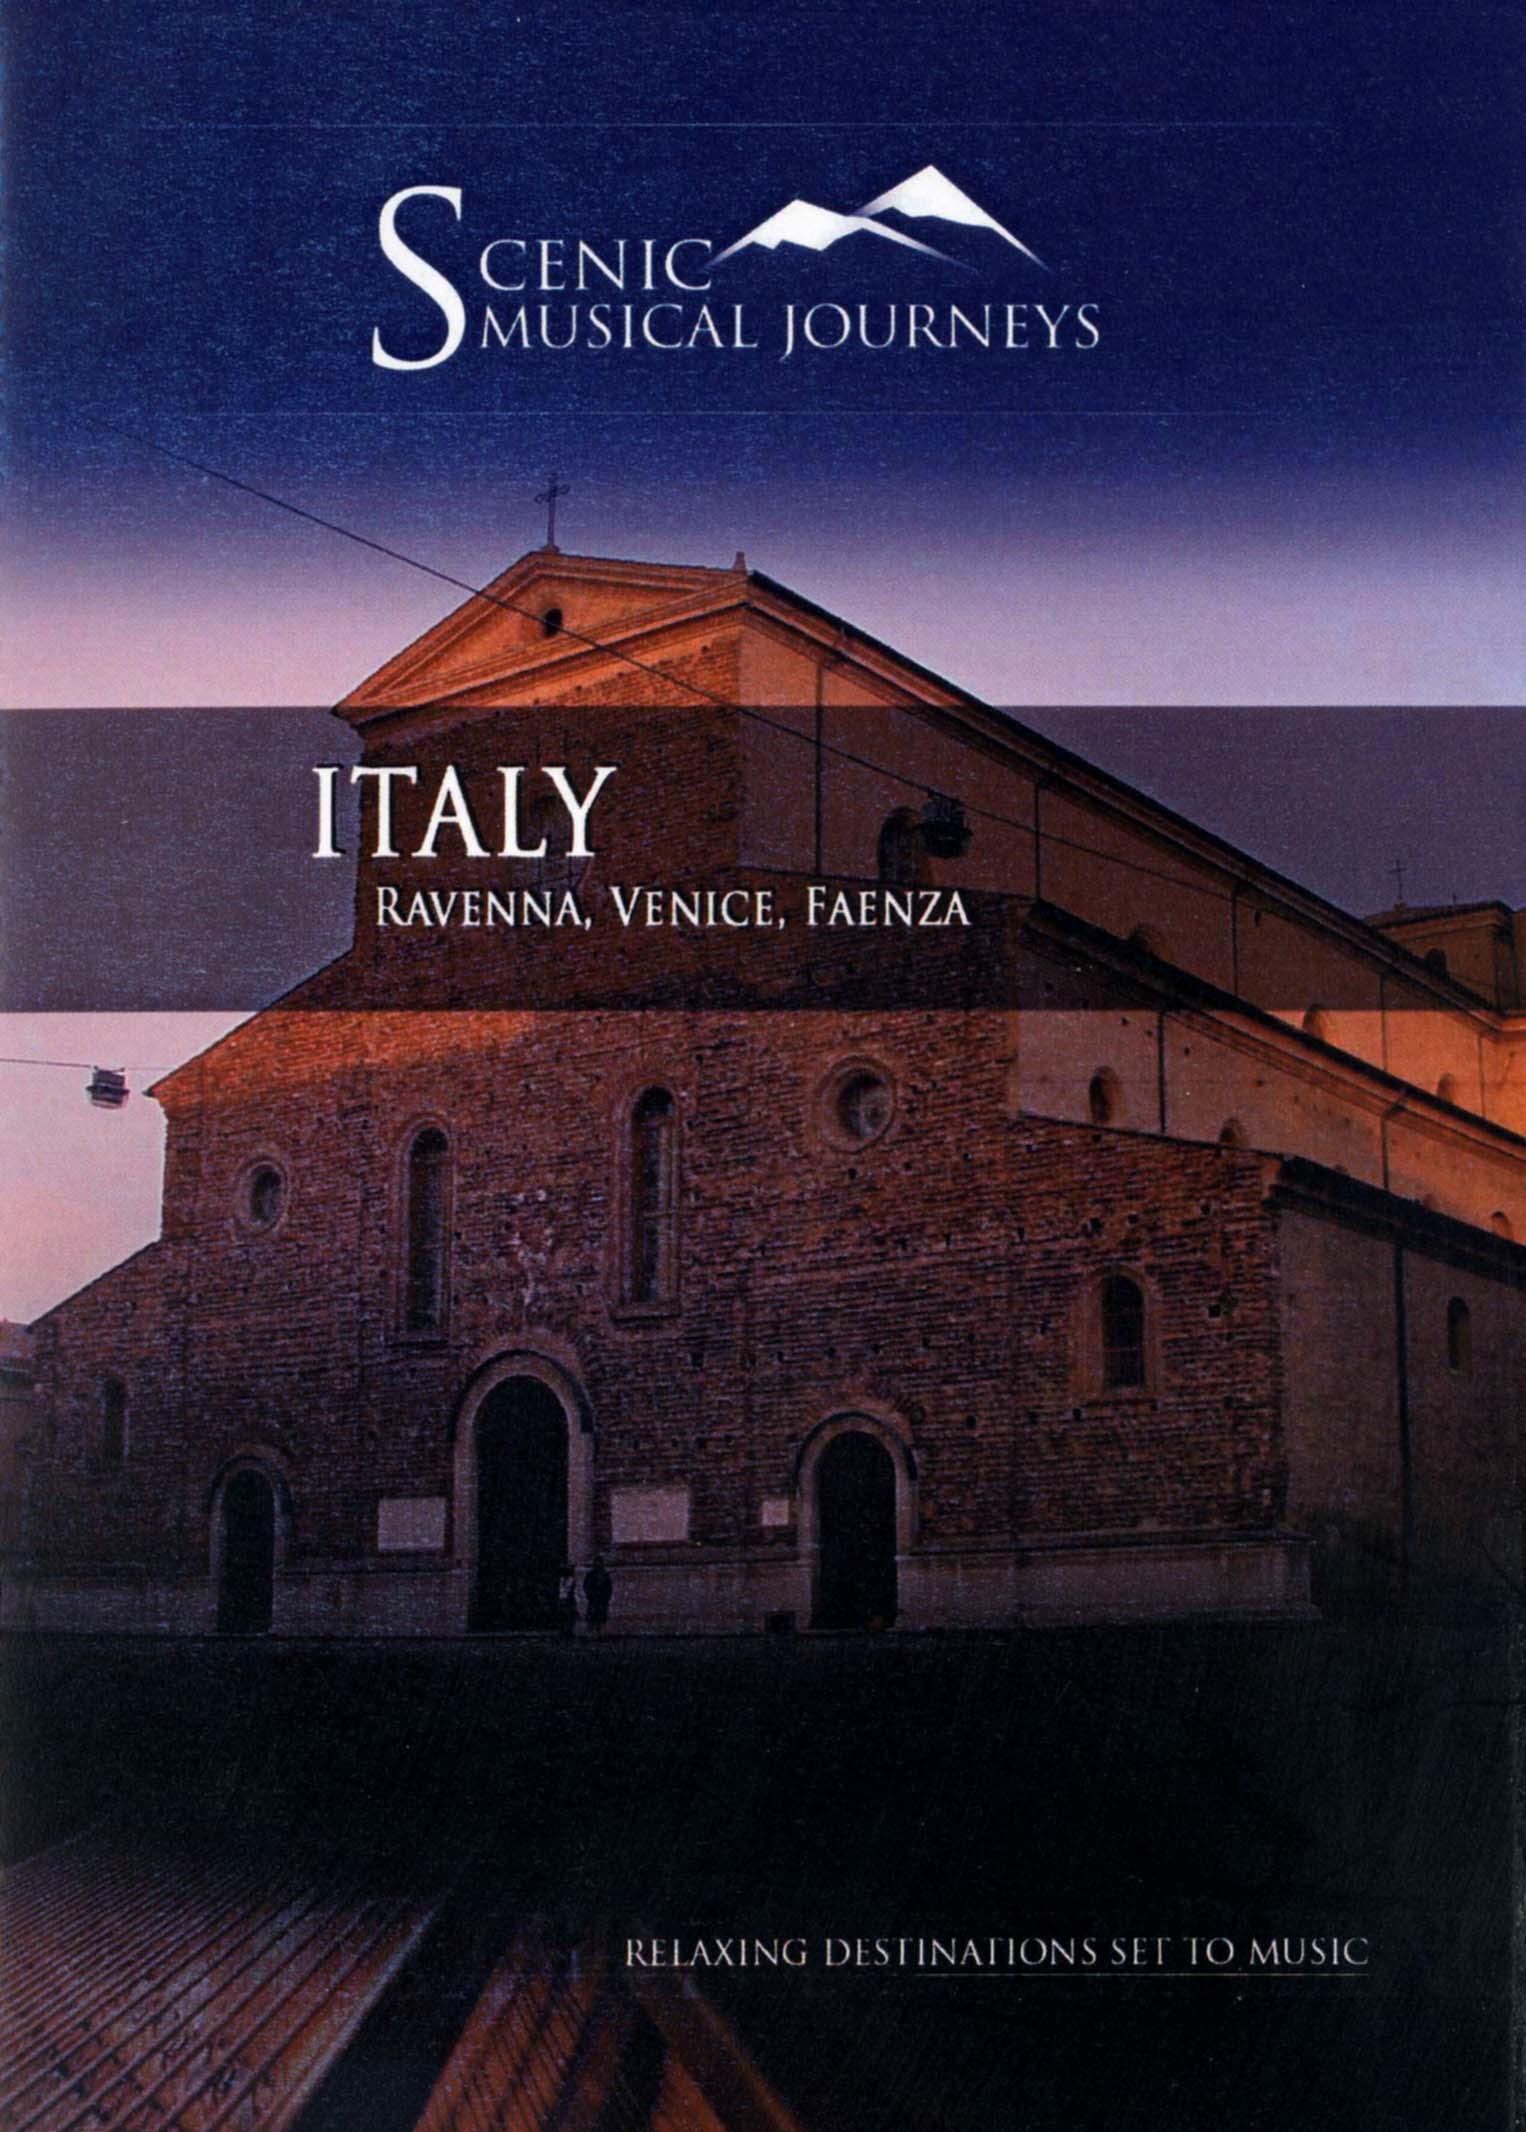 Scenic Musical Journeys: Italy - Ravenna, Venice, Faenza